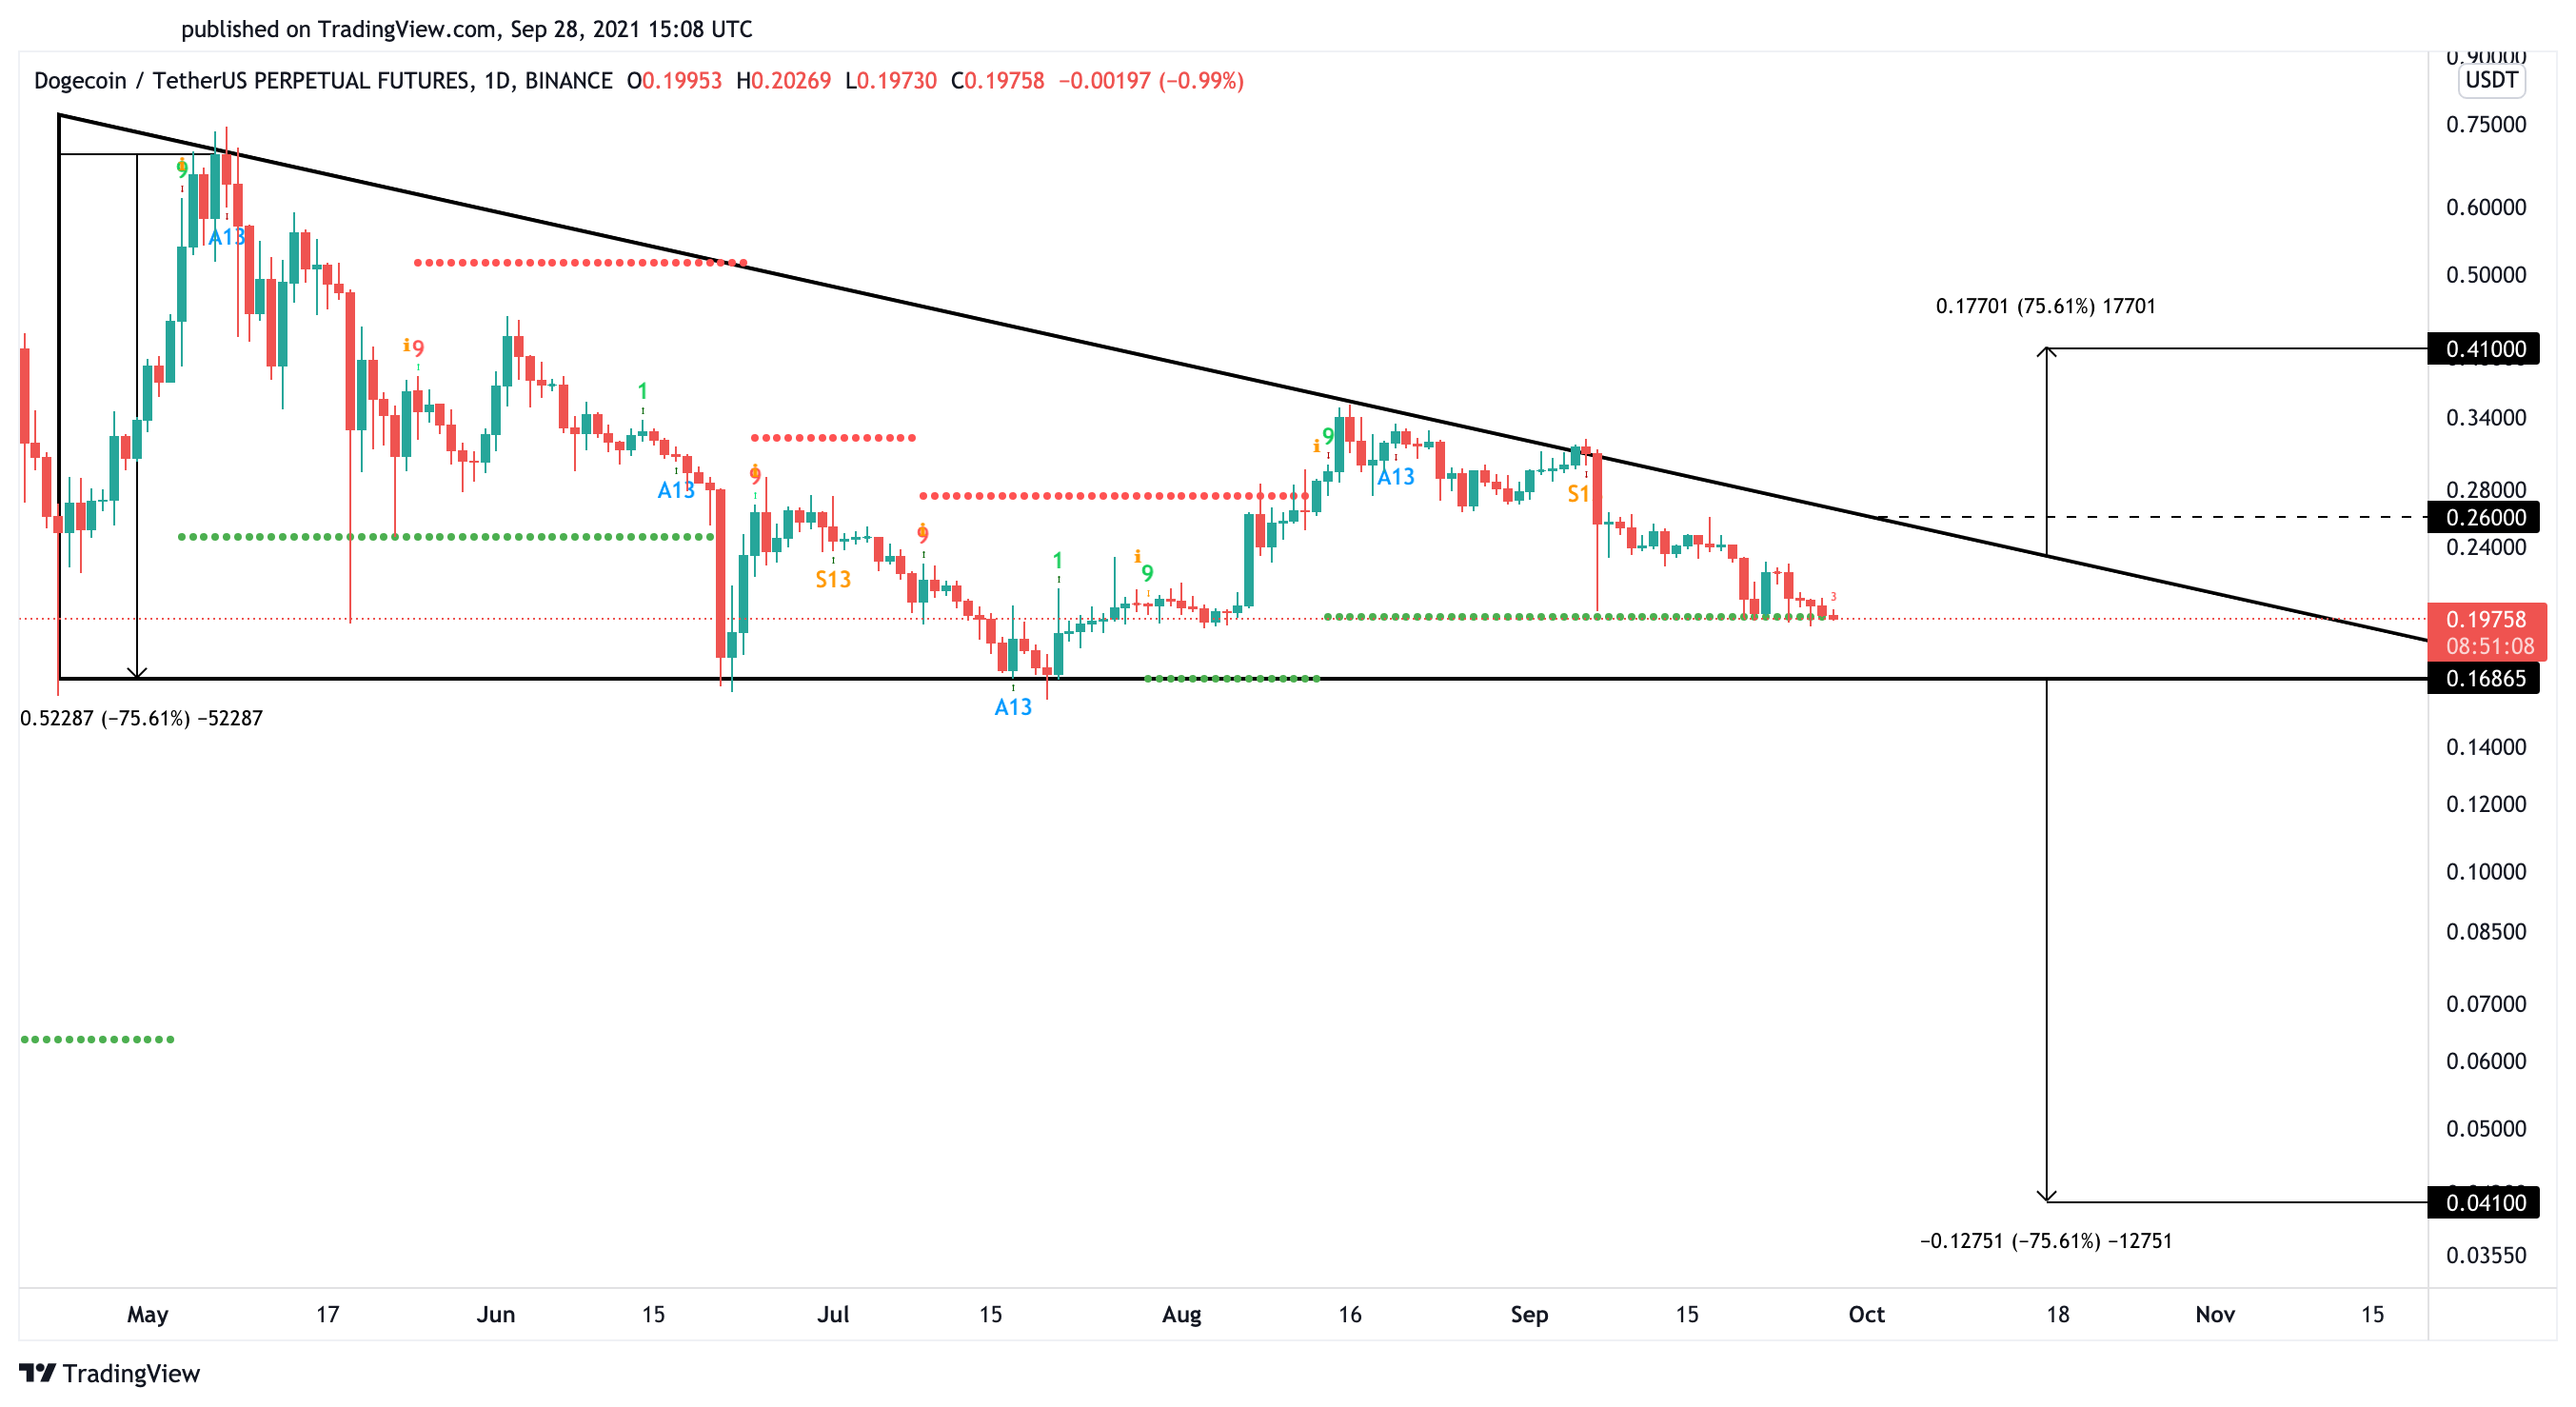 Dogecoin US dollar price chart